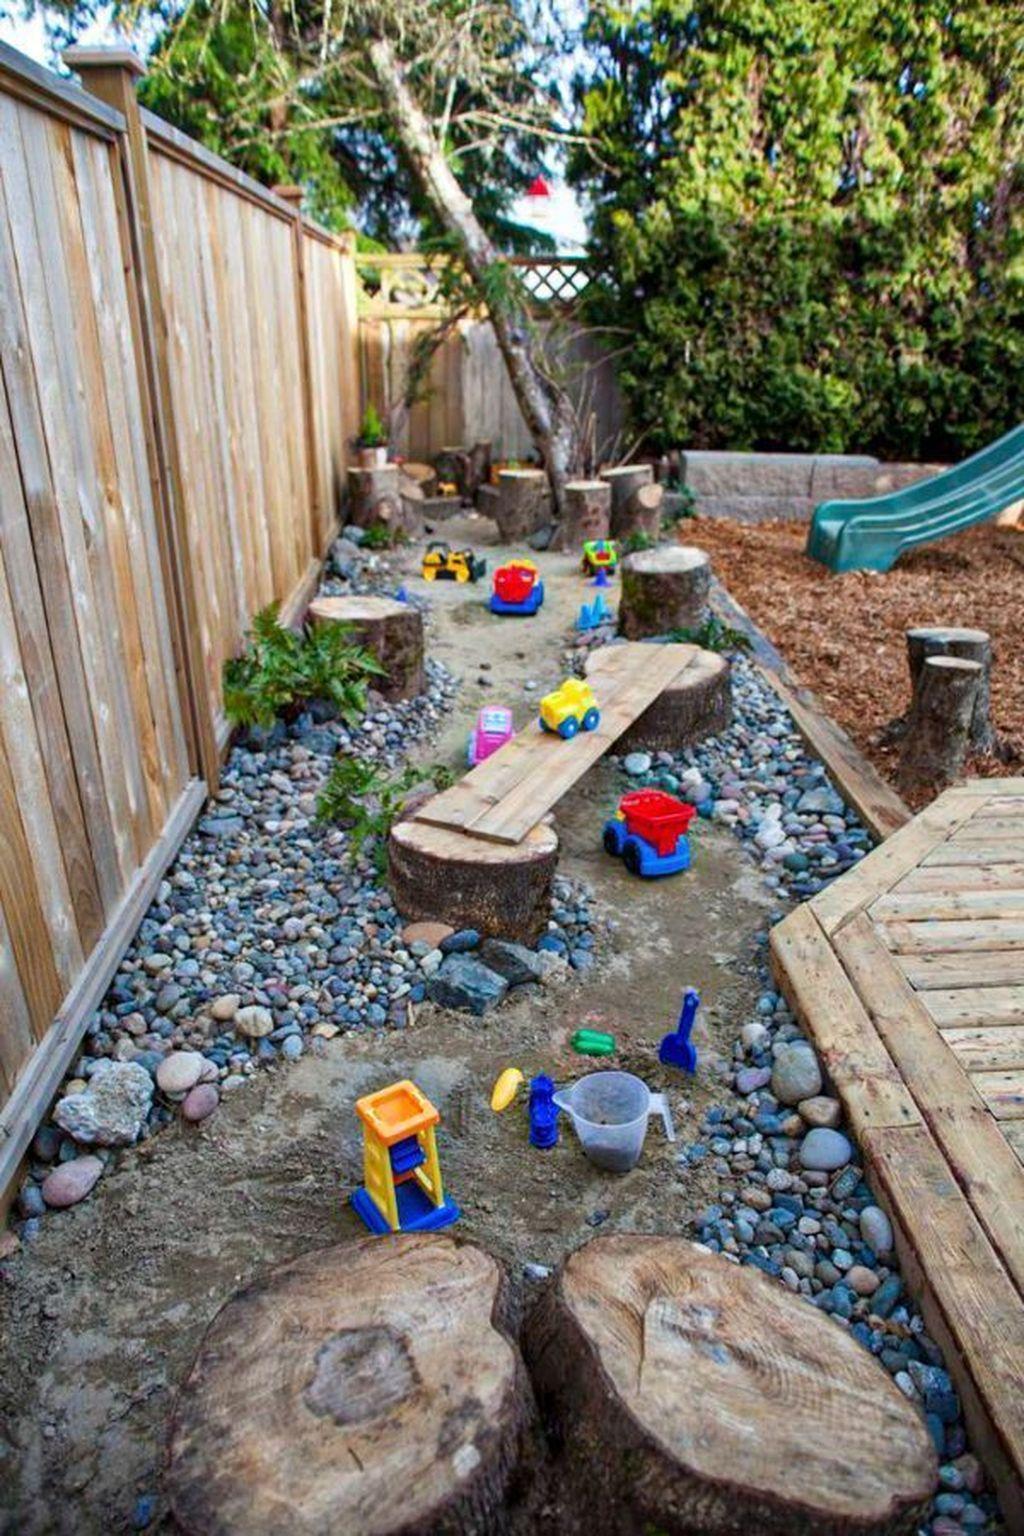 31 Admirable Backyard Playground Design Ideas For Kids Dhoomee Backyard Playground Natural Playground Gardening For Kids